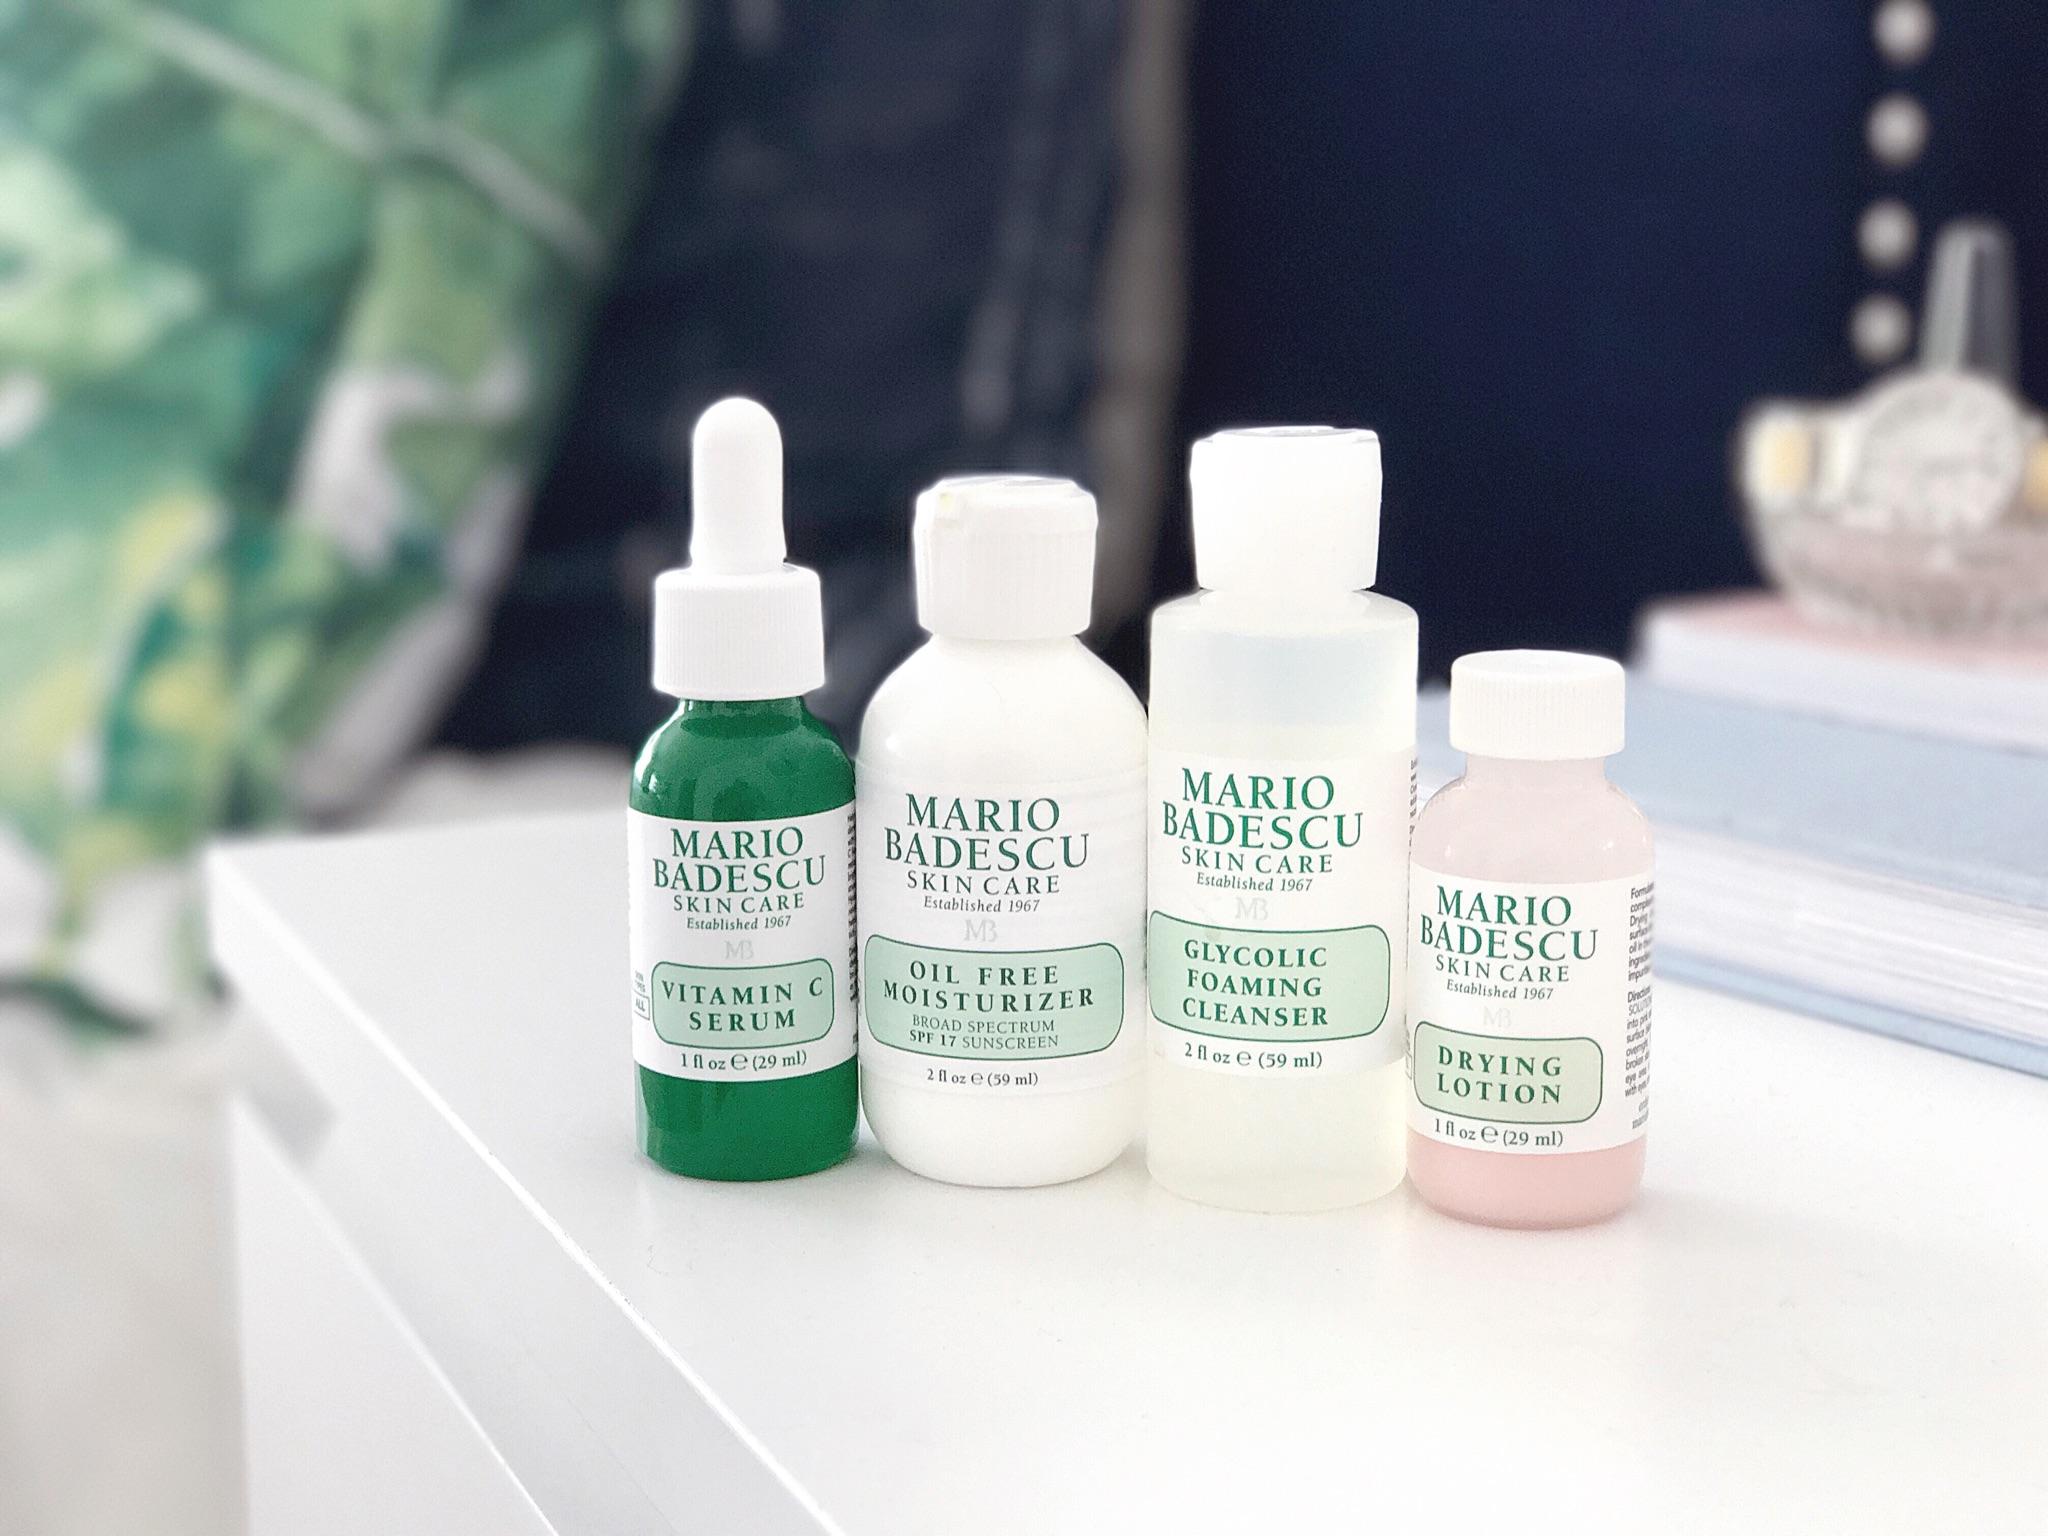 Mario Badescu Bridal Skin Care Routine